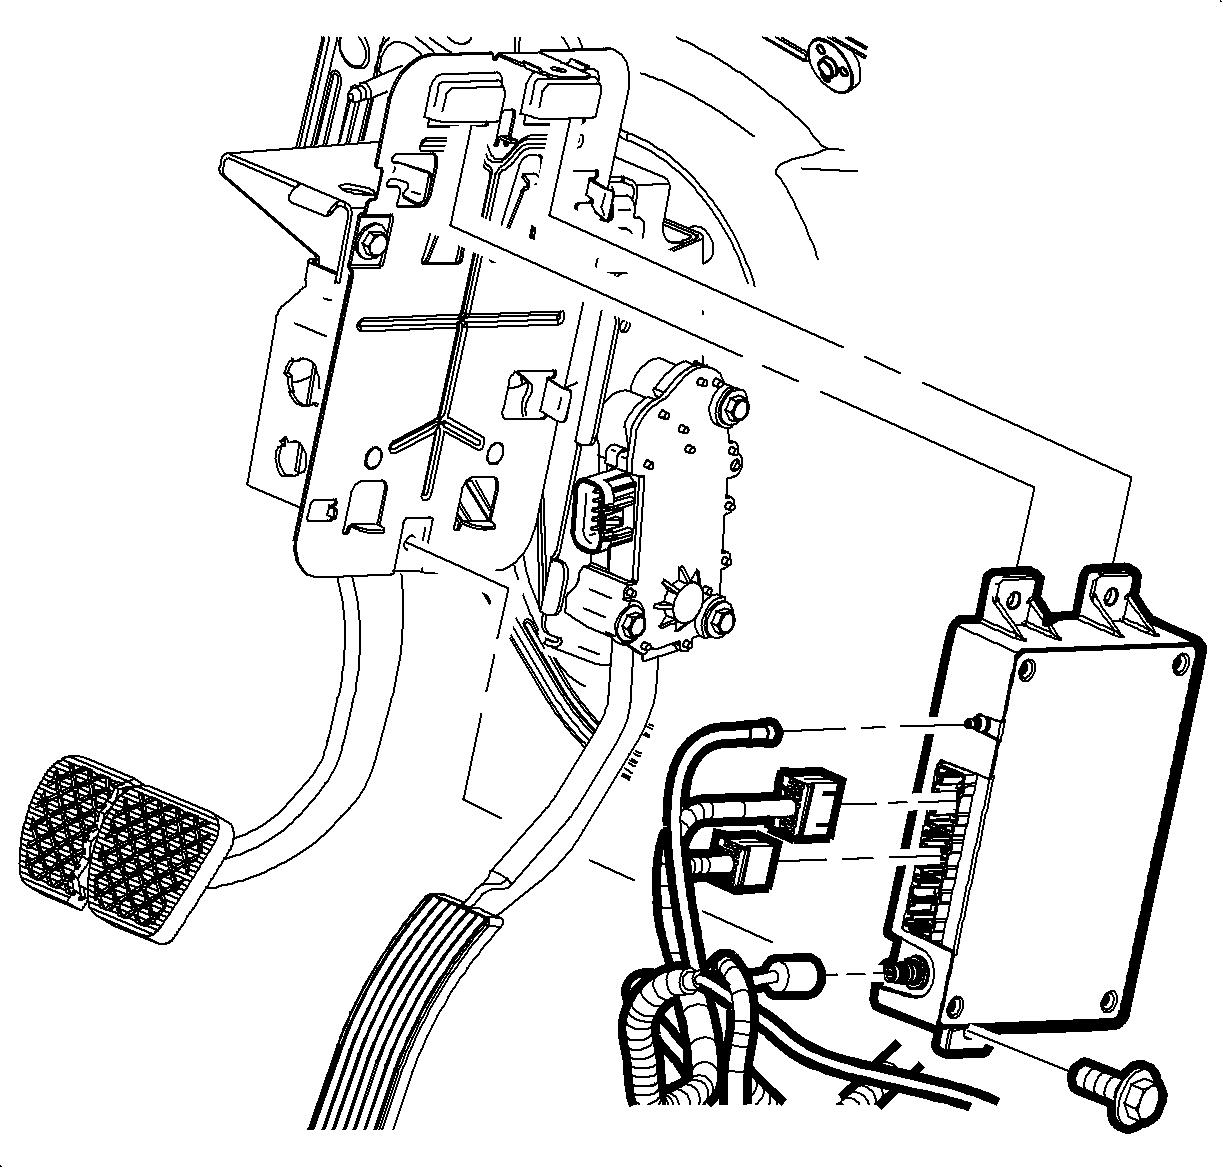 HVAC Mode Door Flutter Noise